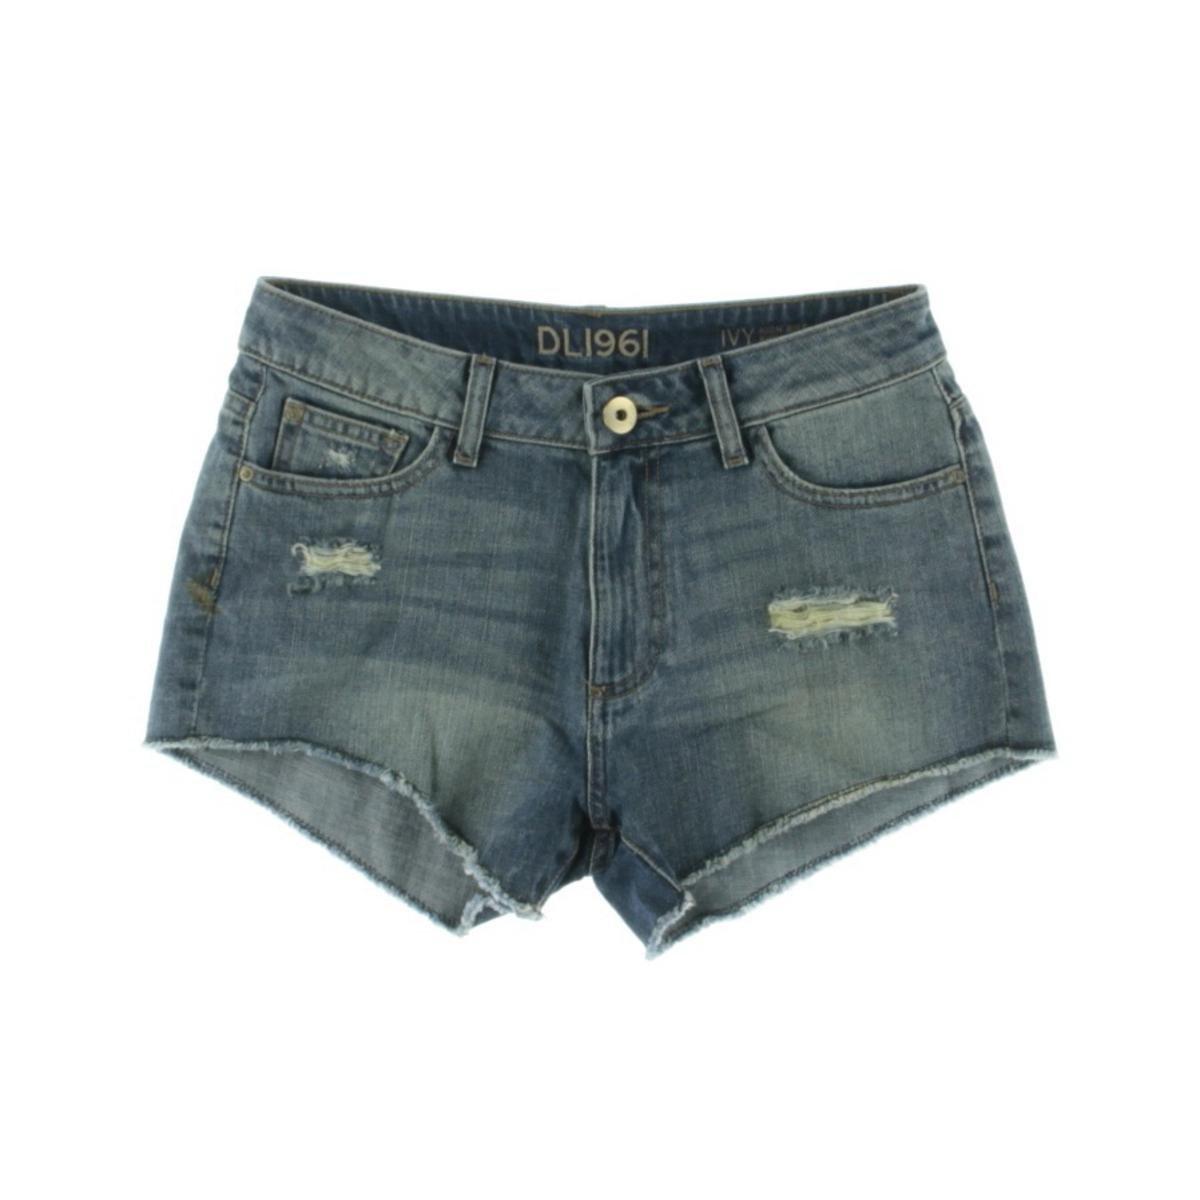 DL1961 Women's Ivy Shorts, Tai, 27